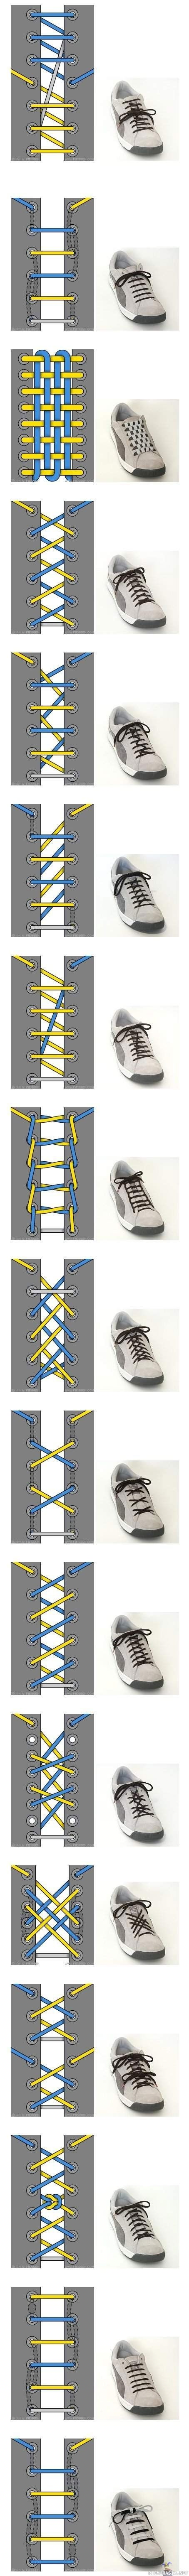 Kengännauhat